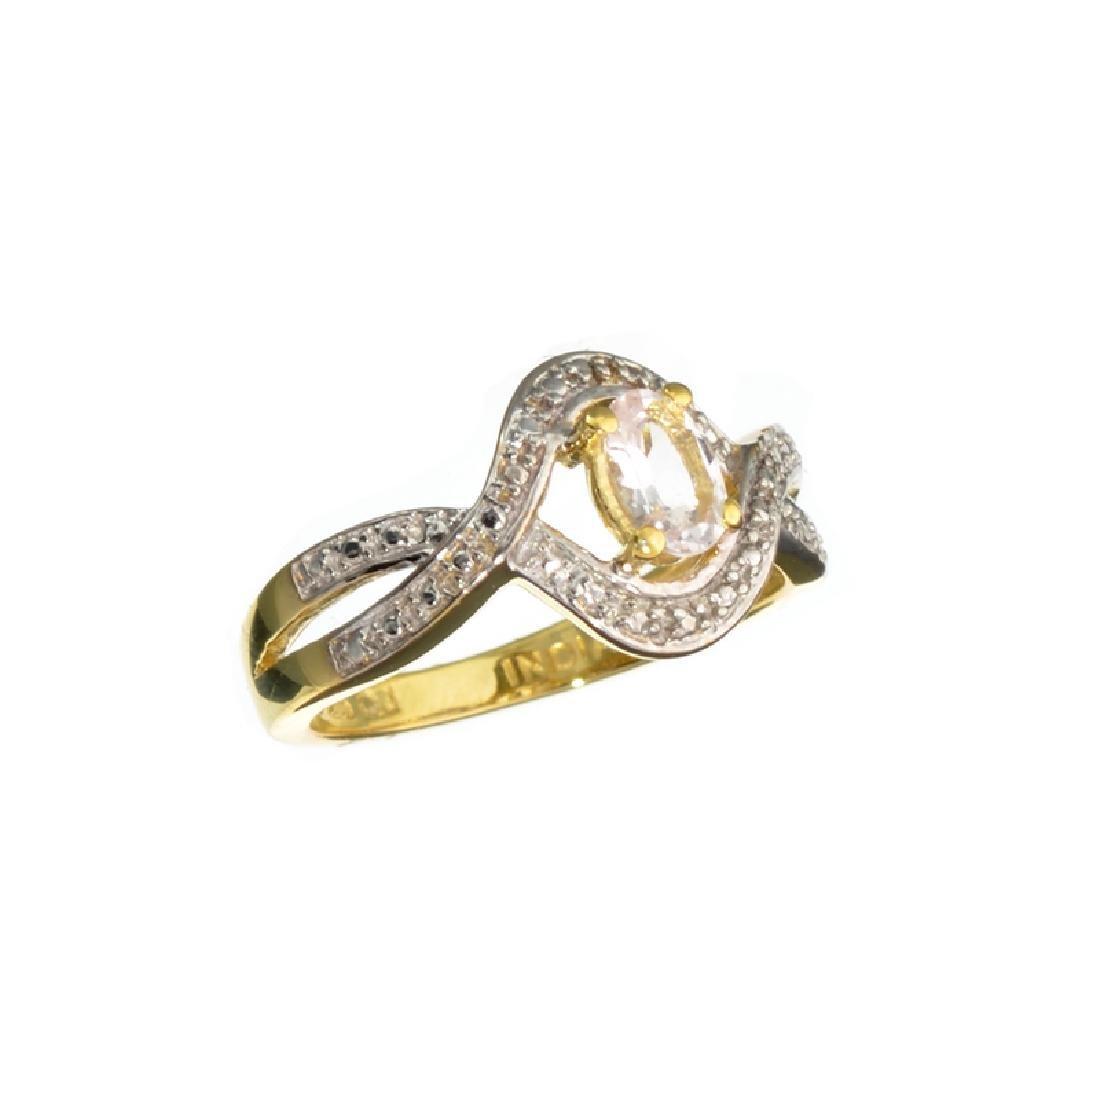 APP: 0.5k Fine Jewelry 0.43CT Oval Cut Morganite Over